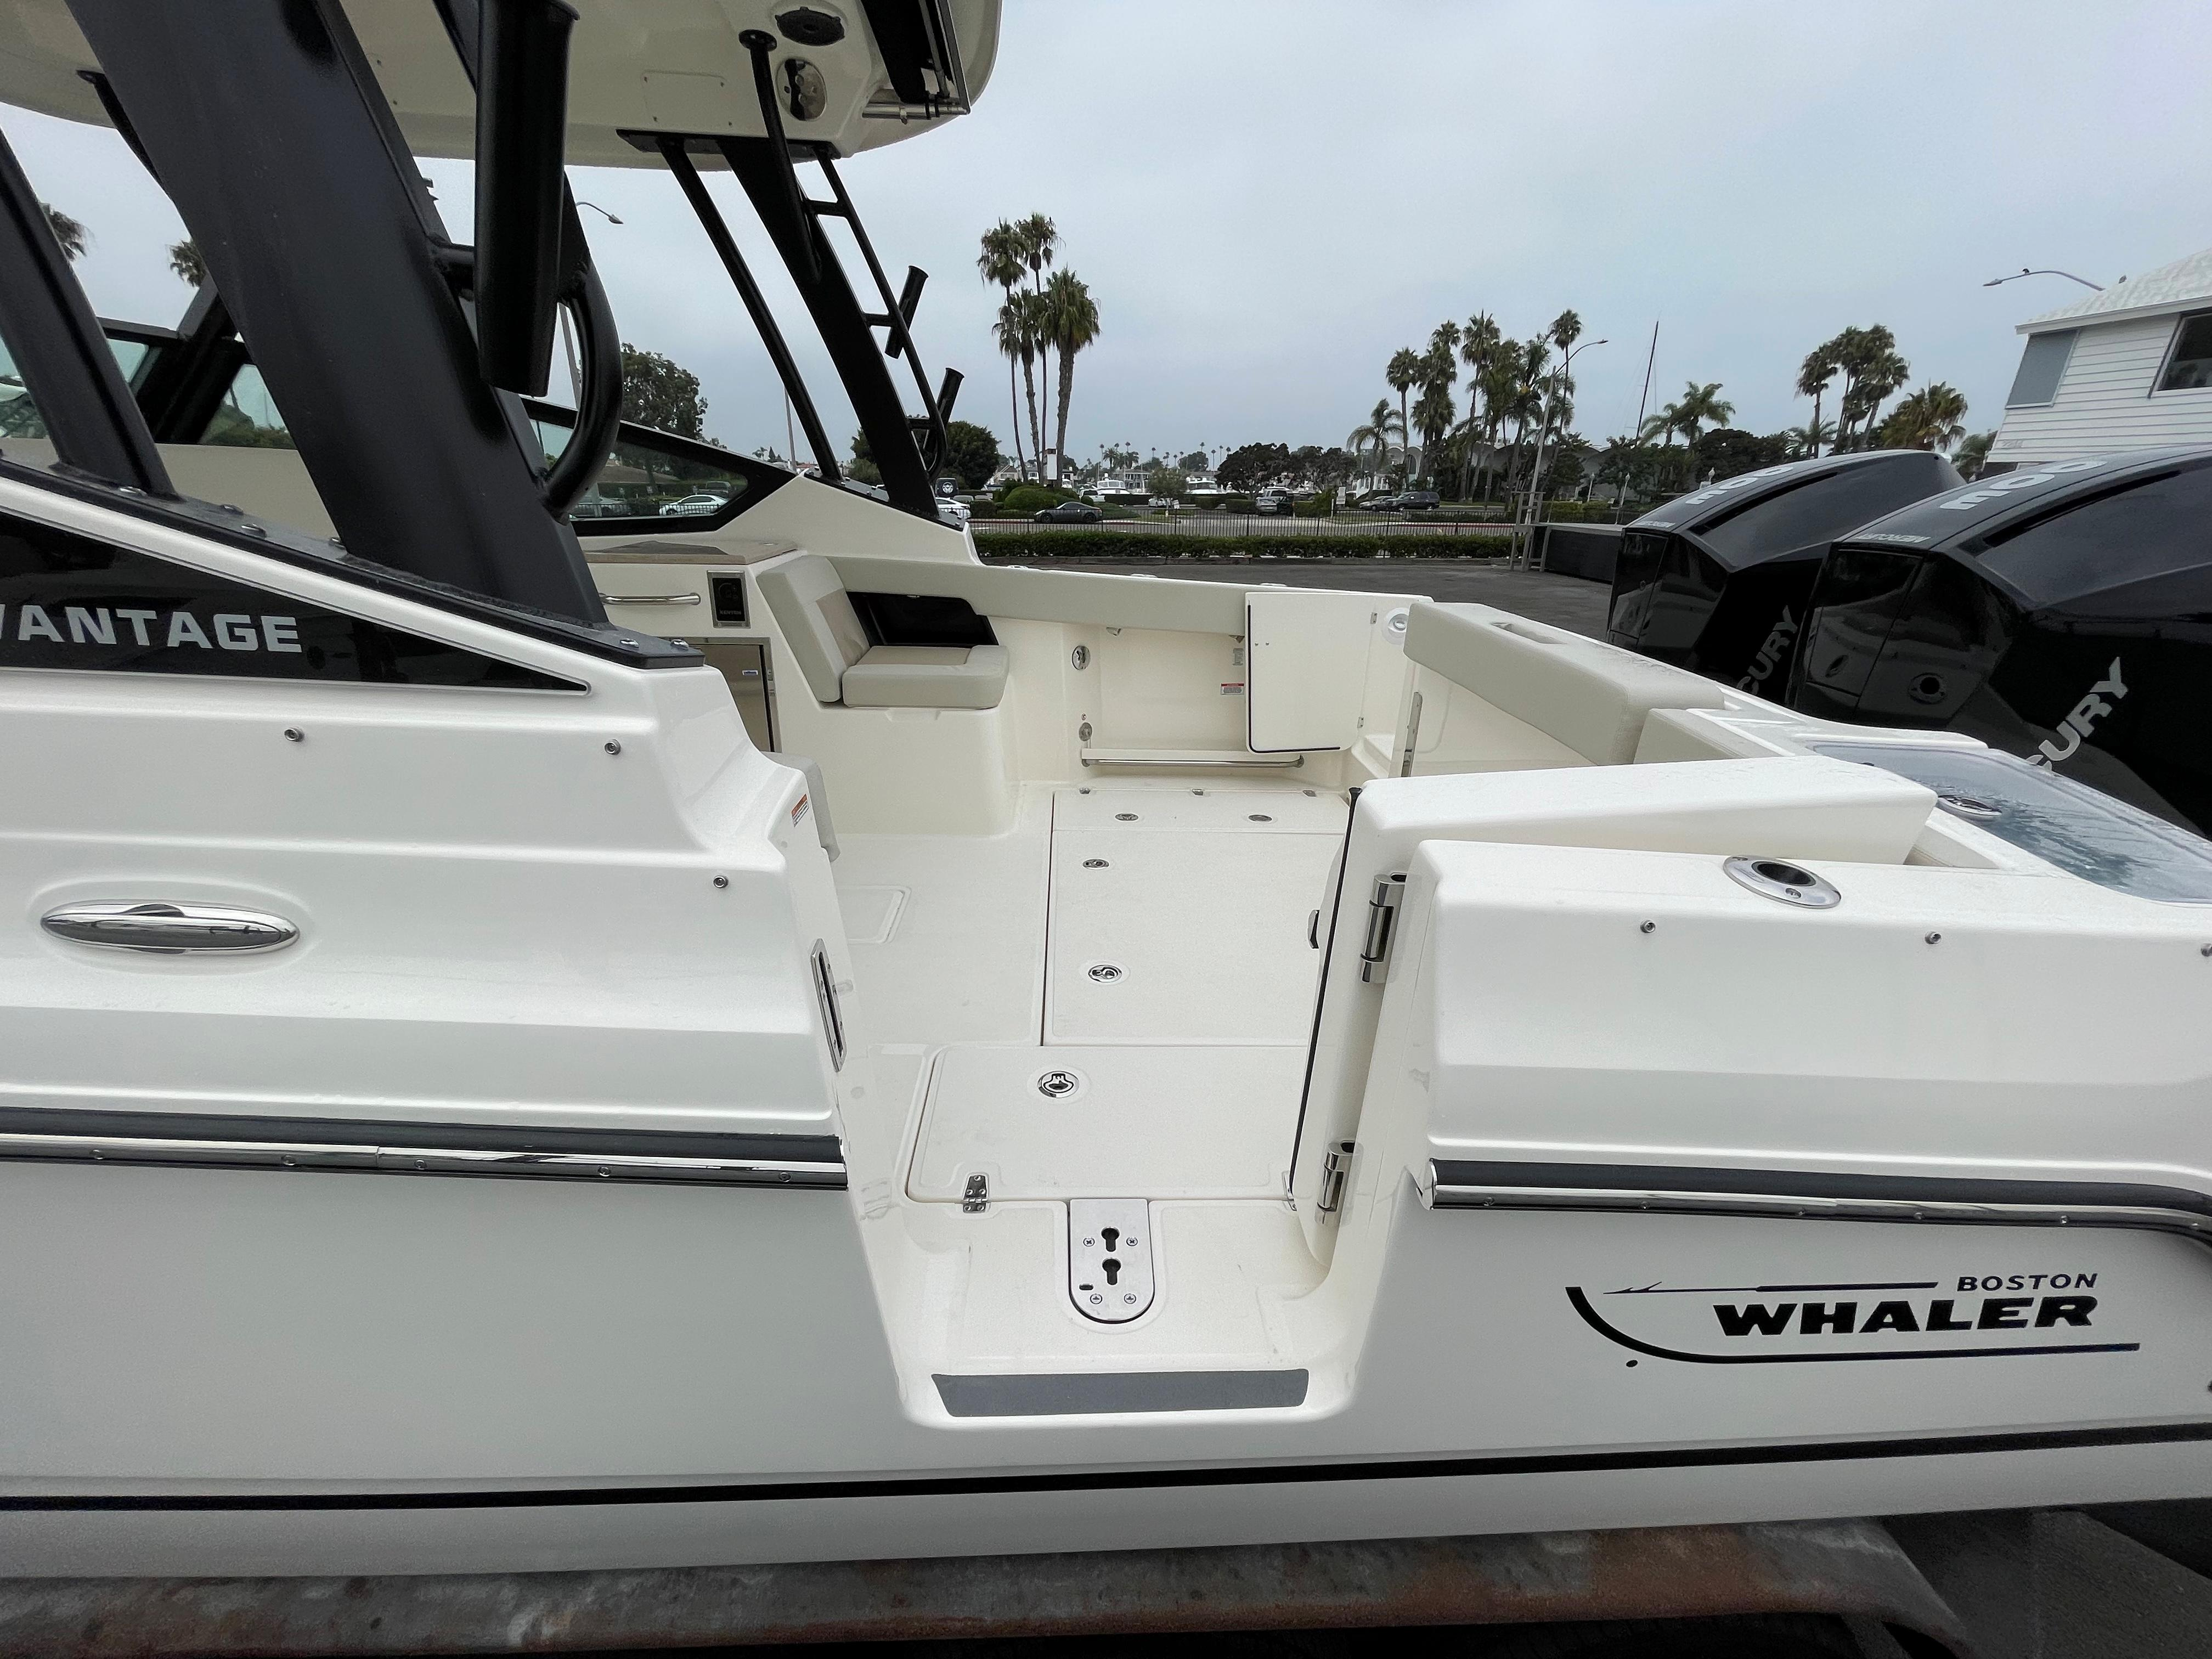 2021 Boston Whaler 280 Vantage #BW0475G inventory image at Sun Country Coastal in Newport Beach